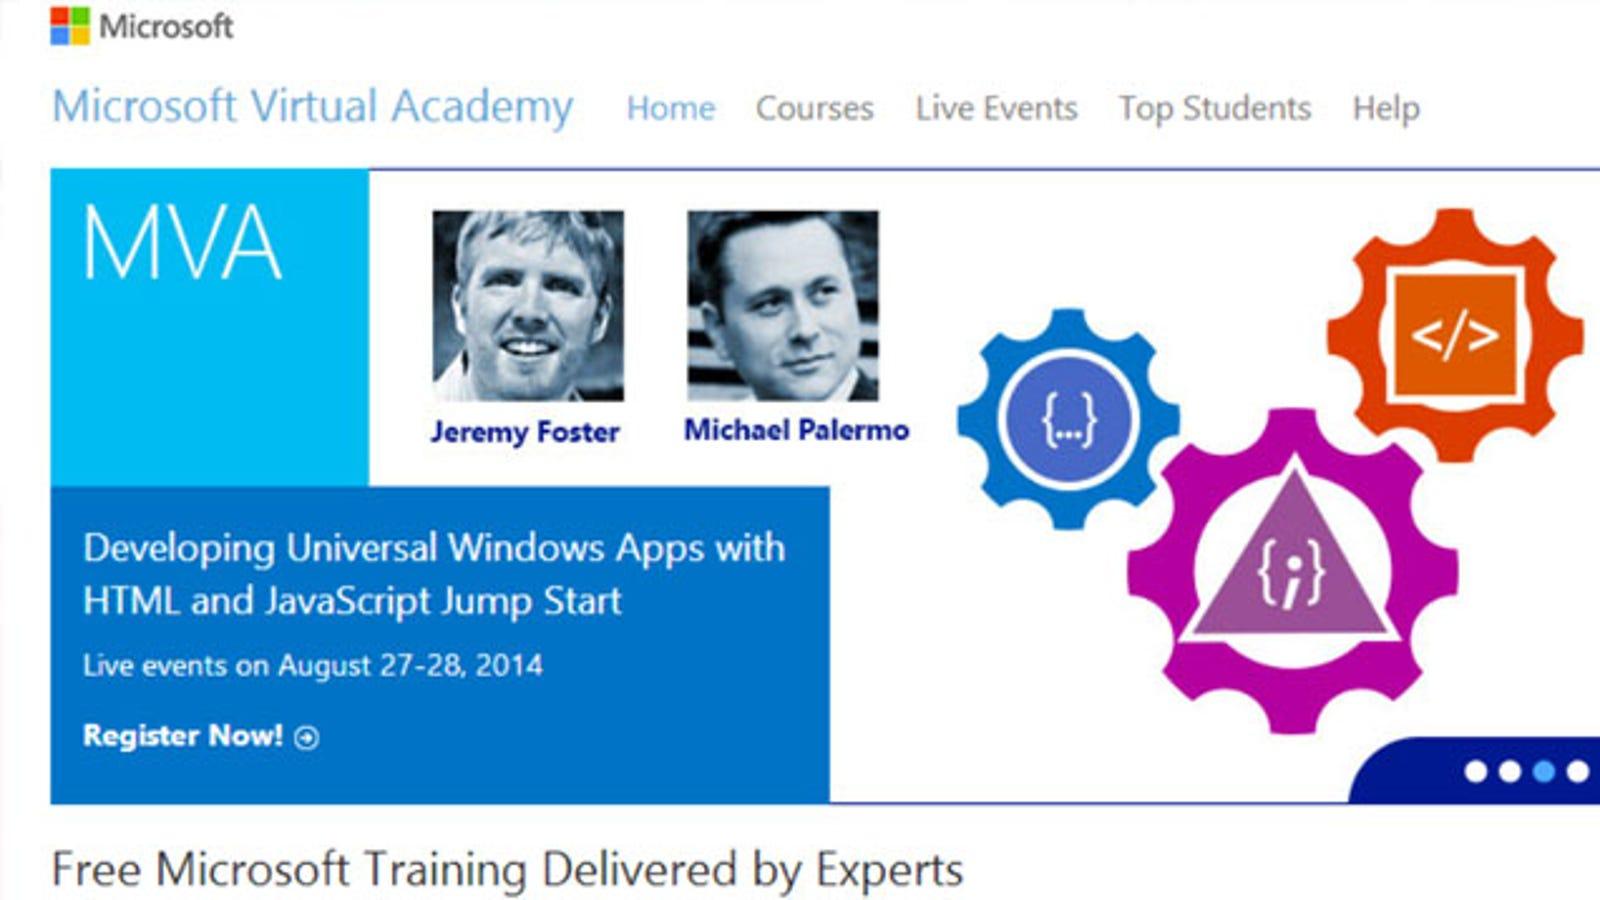 Get Free IT Training with Microsoft Virtual Academy